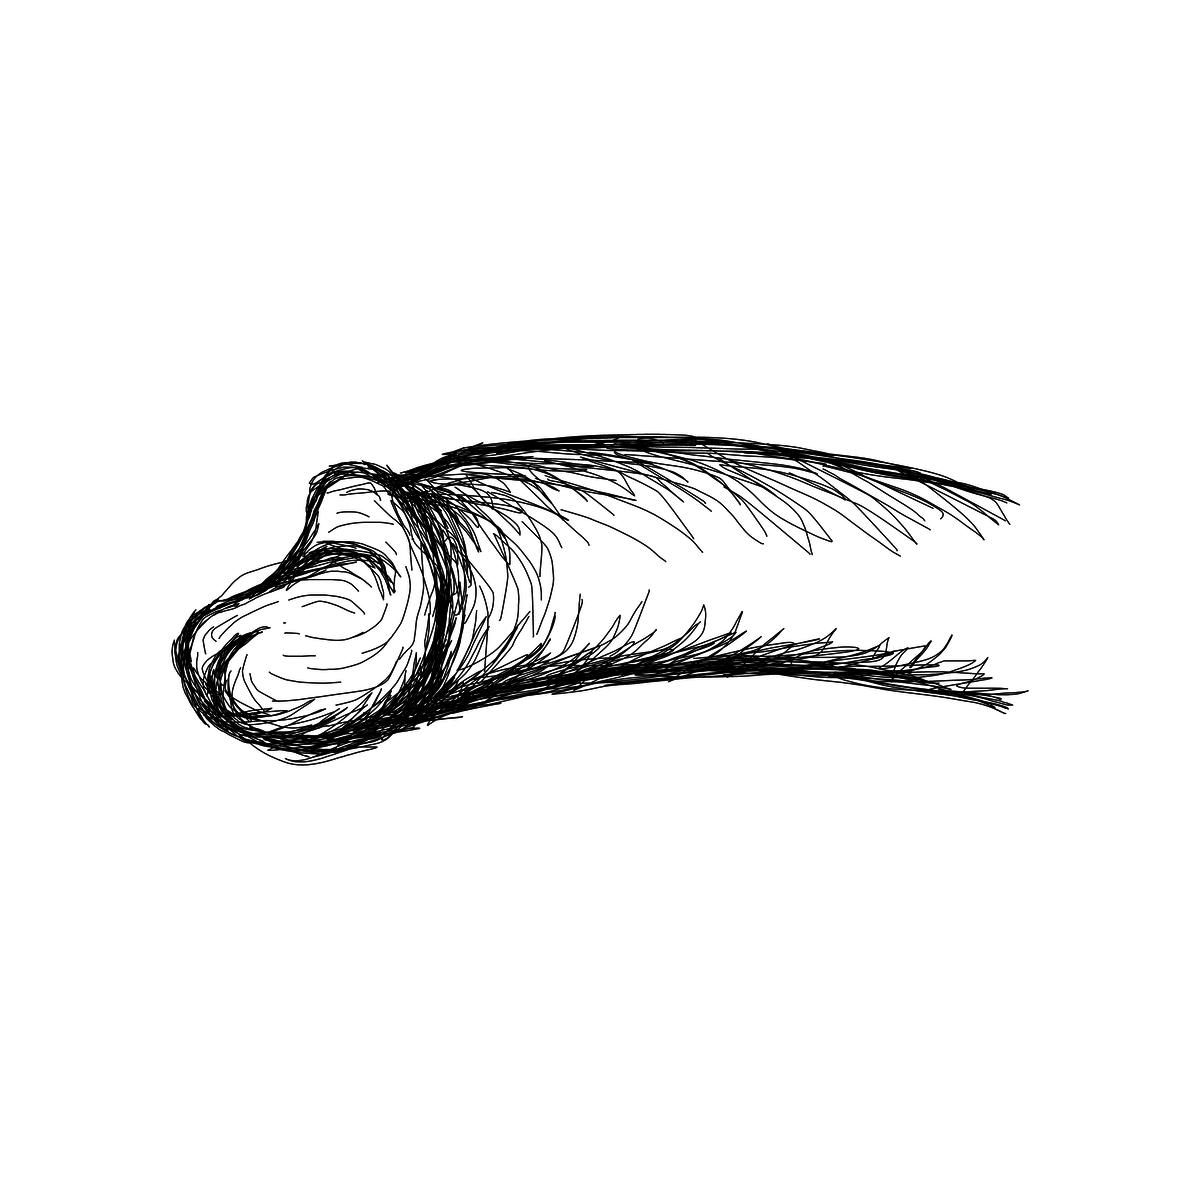 BAAAM drawing#18264 lat:-23.5473022460937500lng: -46.6349754333496100